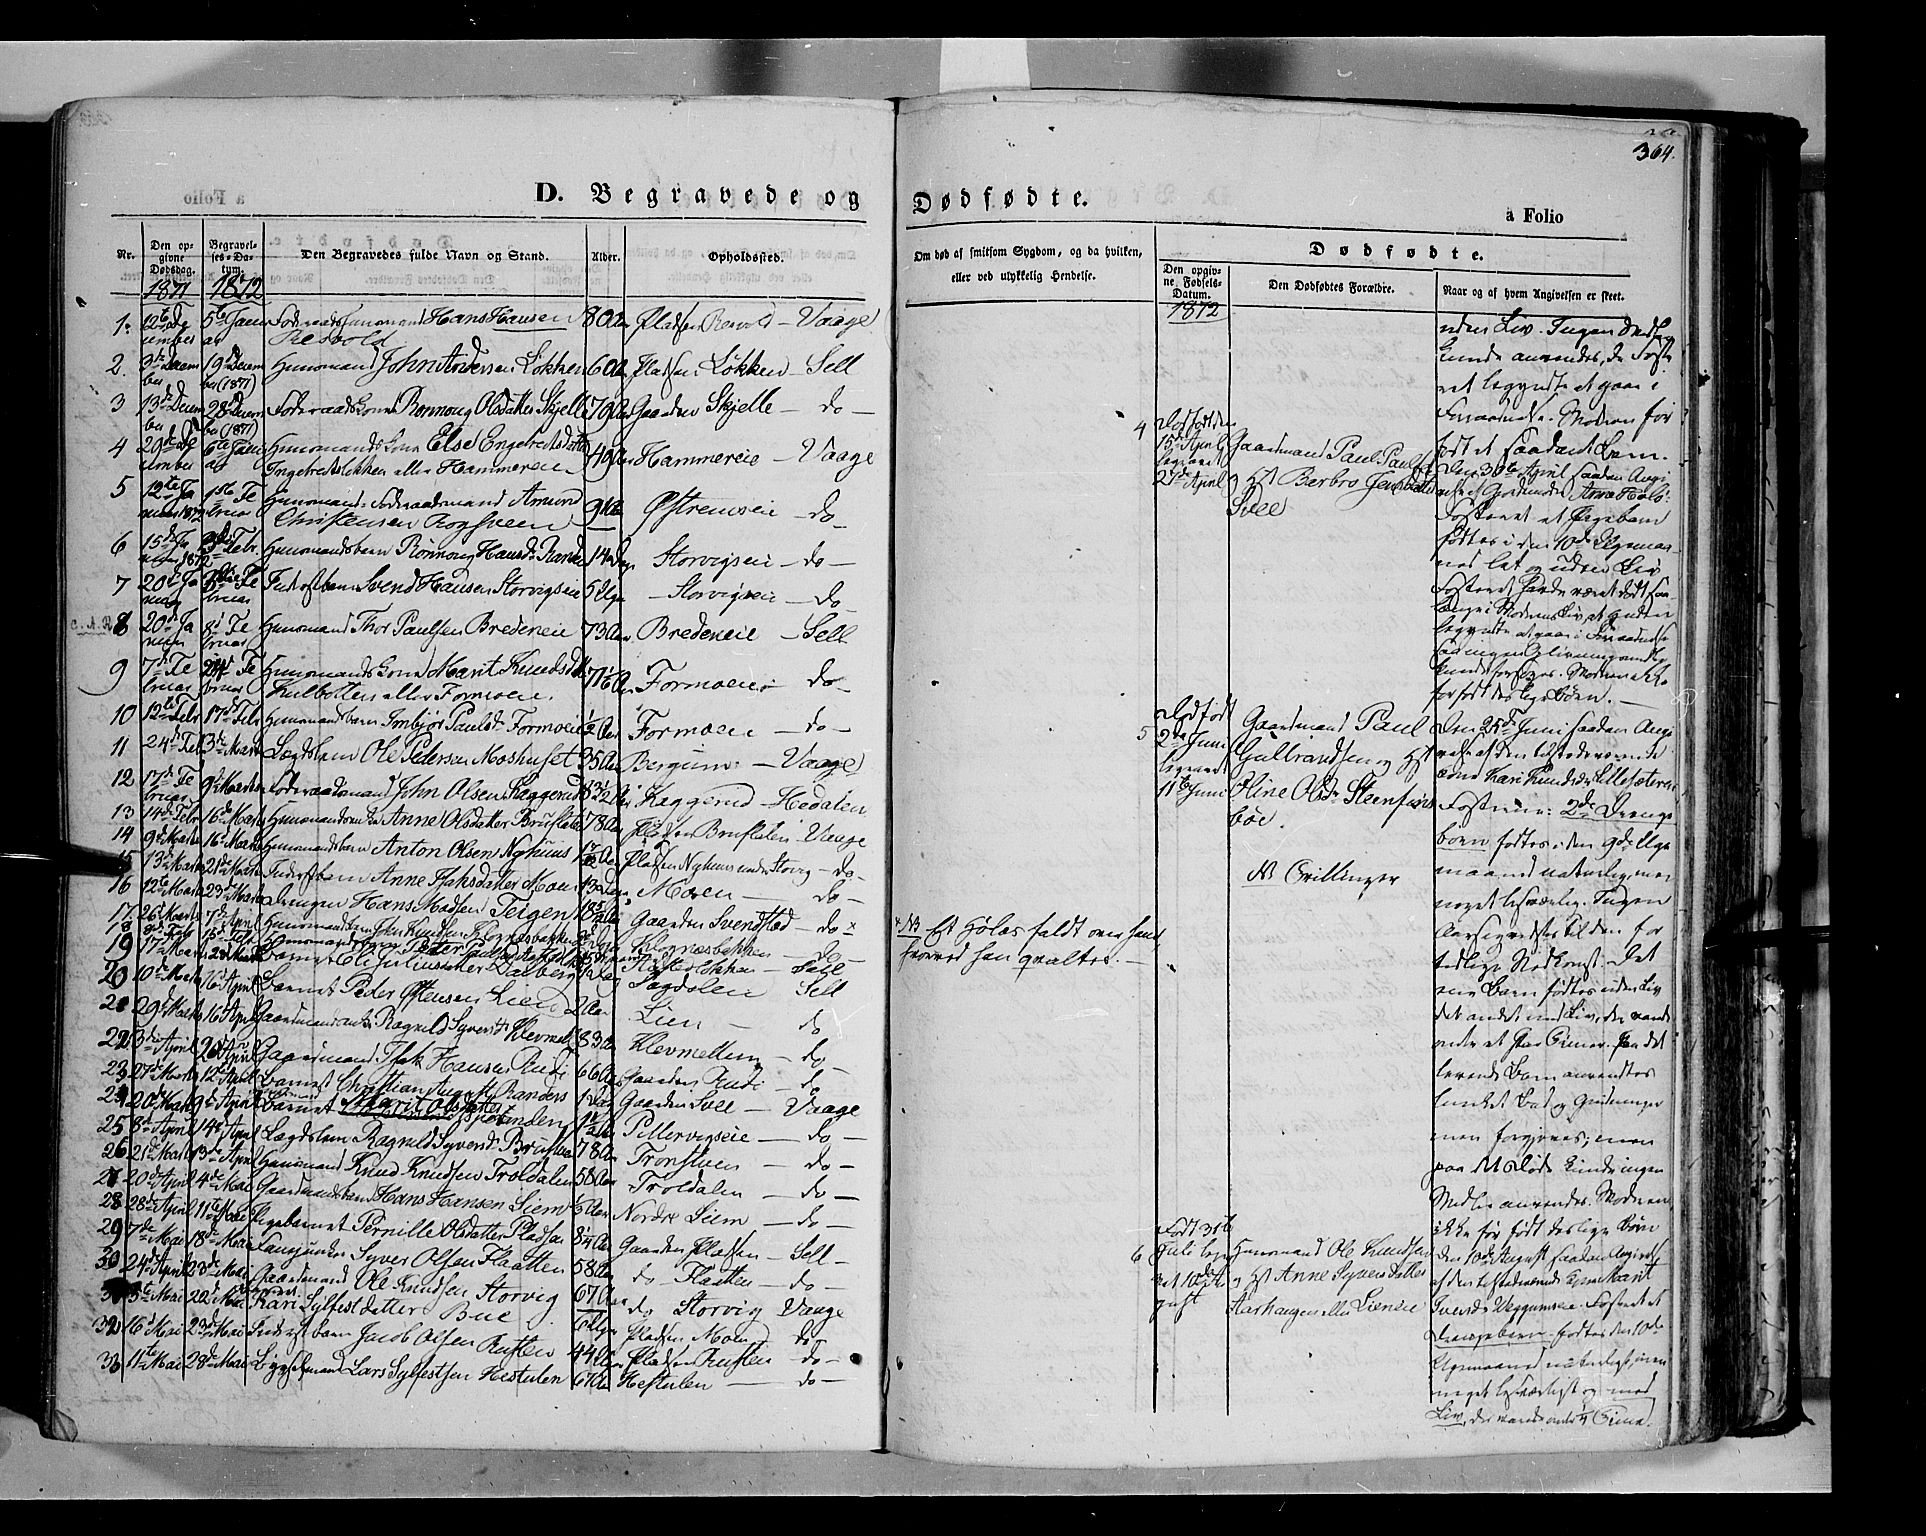 SAH, Vågå prestekontor, Ministerialbok nr. 6 /1, 1856-1872, s. 364